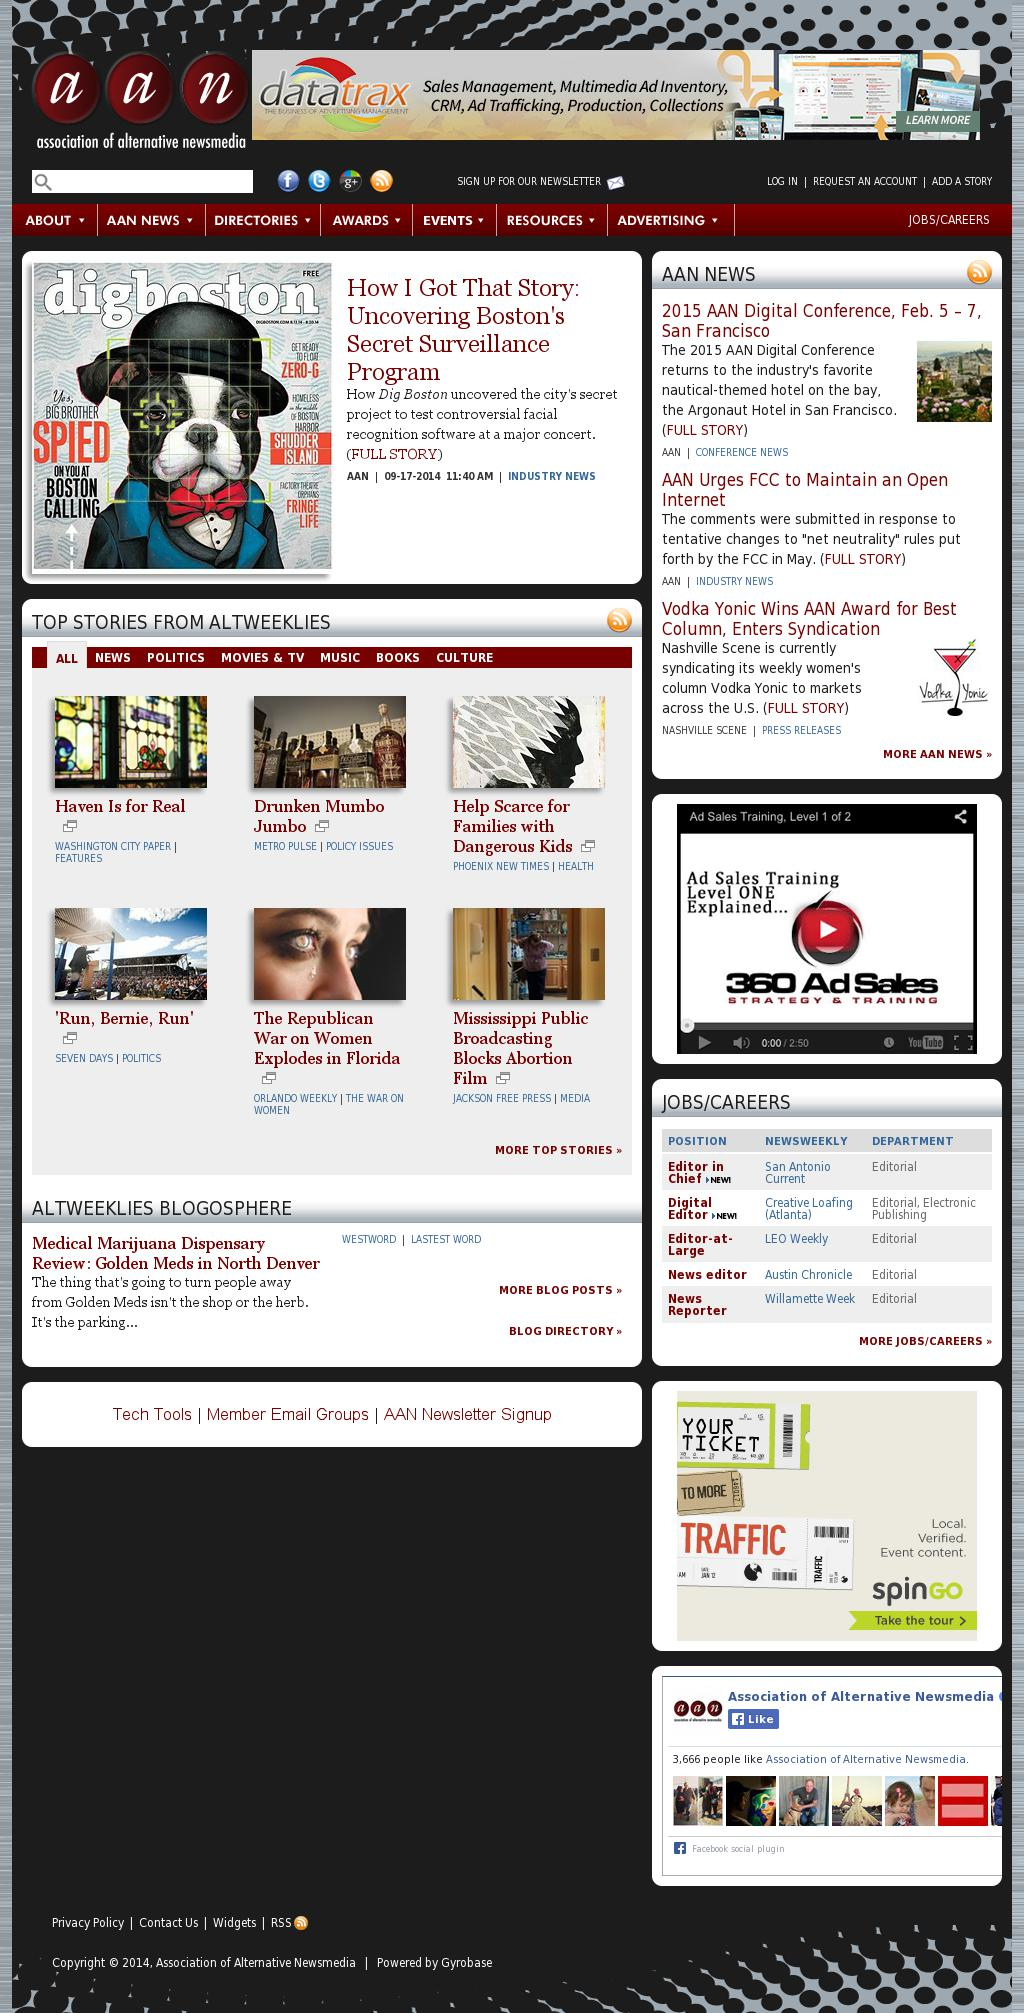 Association of Alternative Newsmedia at Friday Sept. 19, 2014, 11 a.m. UTC